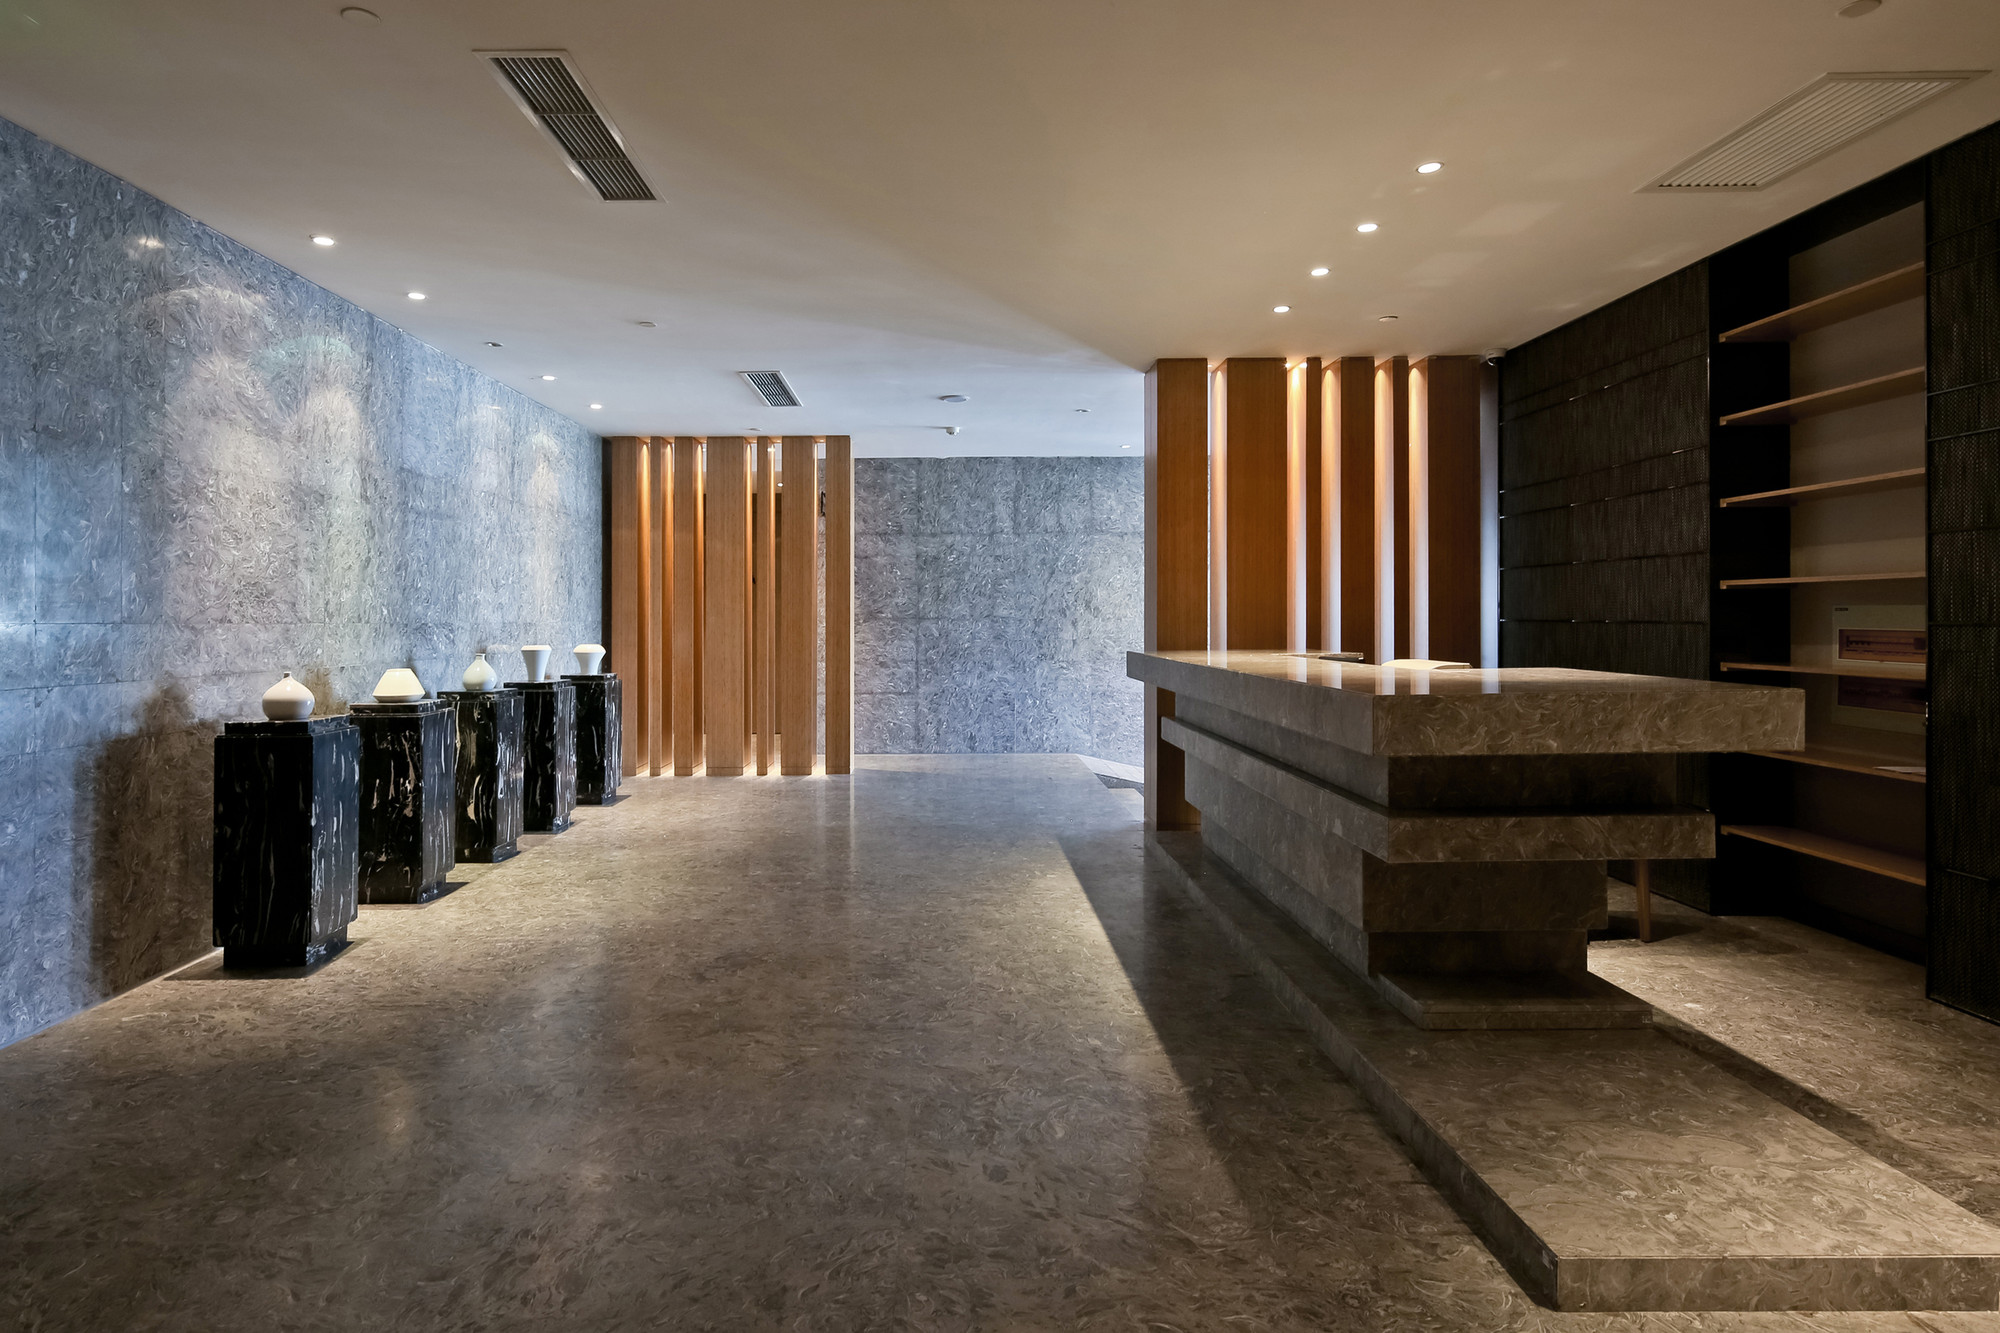 gallery of jiahe boutique hotel shangai dushe architecture design 33. Black Bedroom Furniture Sets. Home Design Ideas